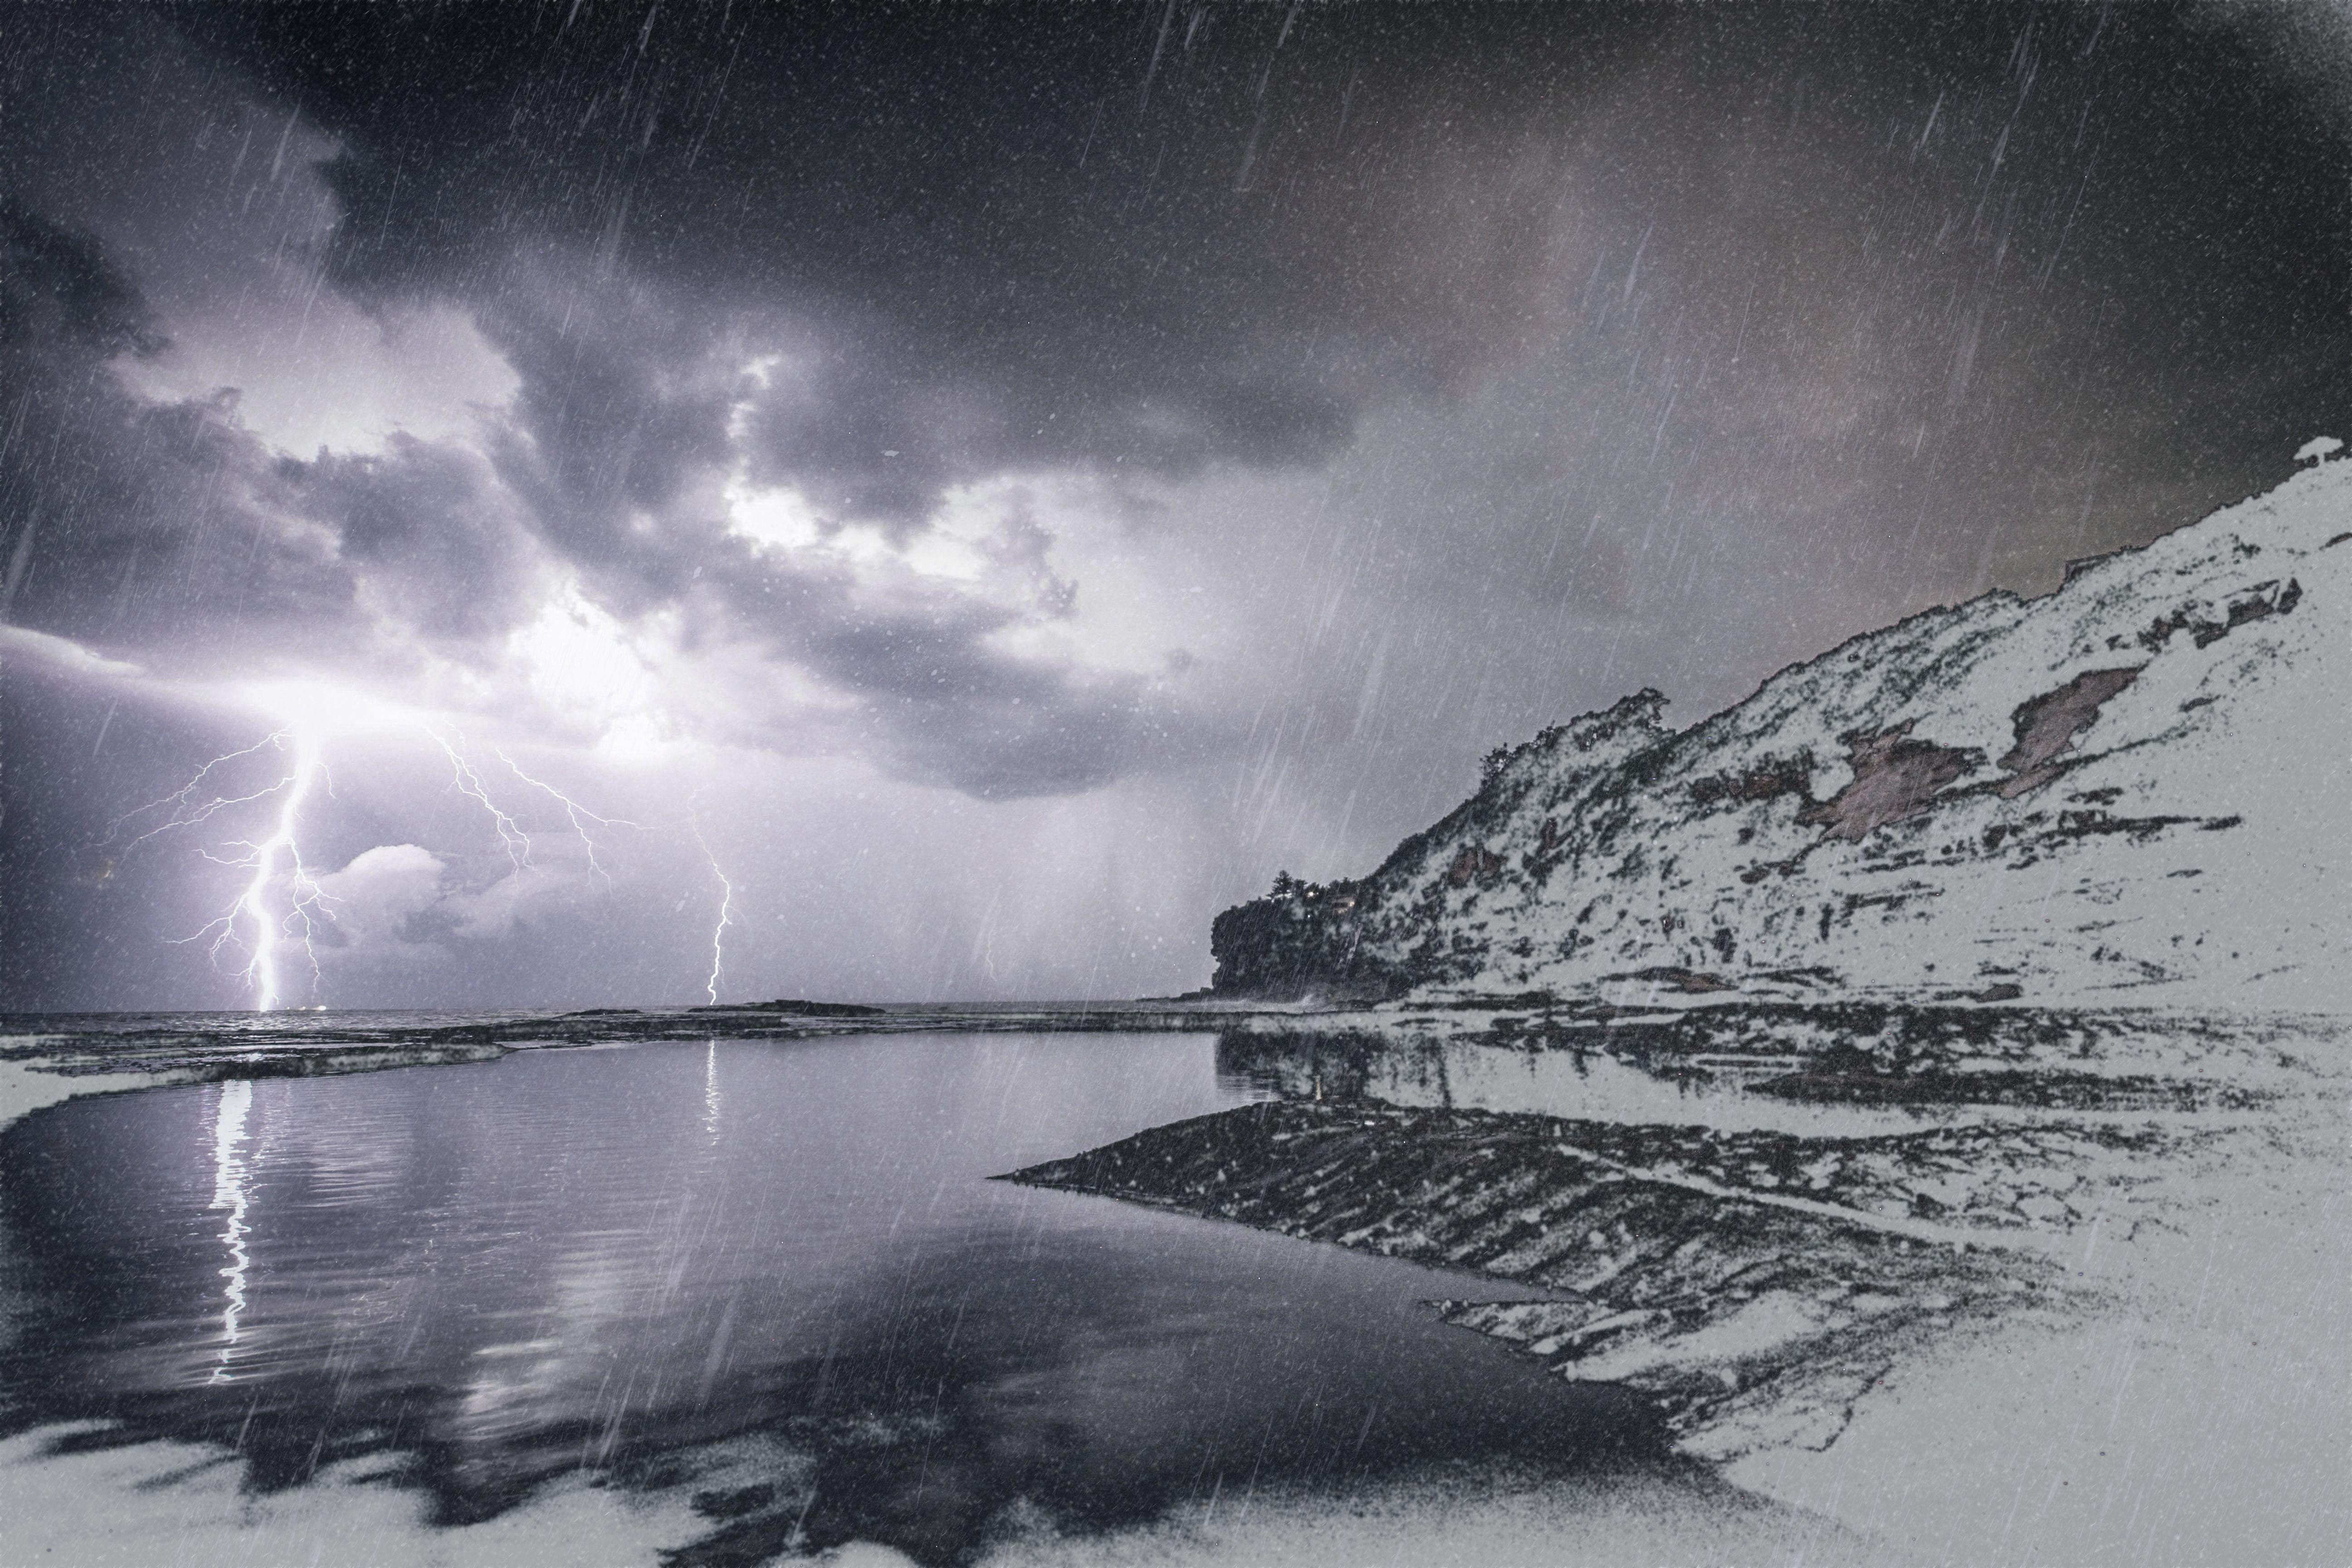 thundersnow - photo #3